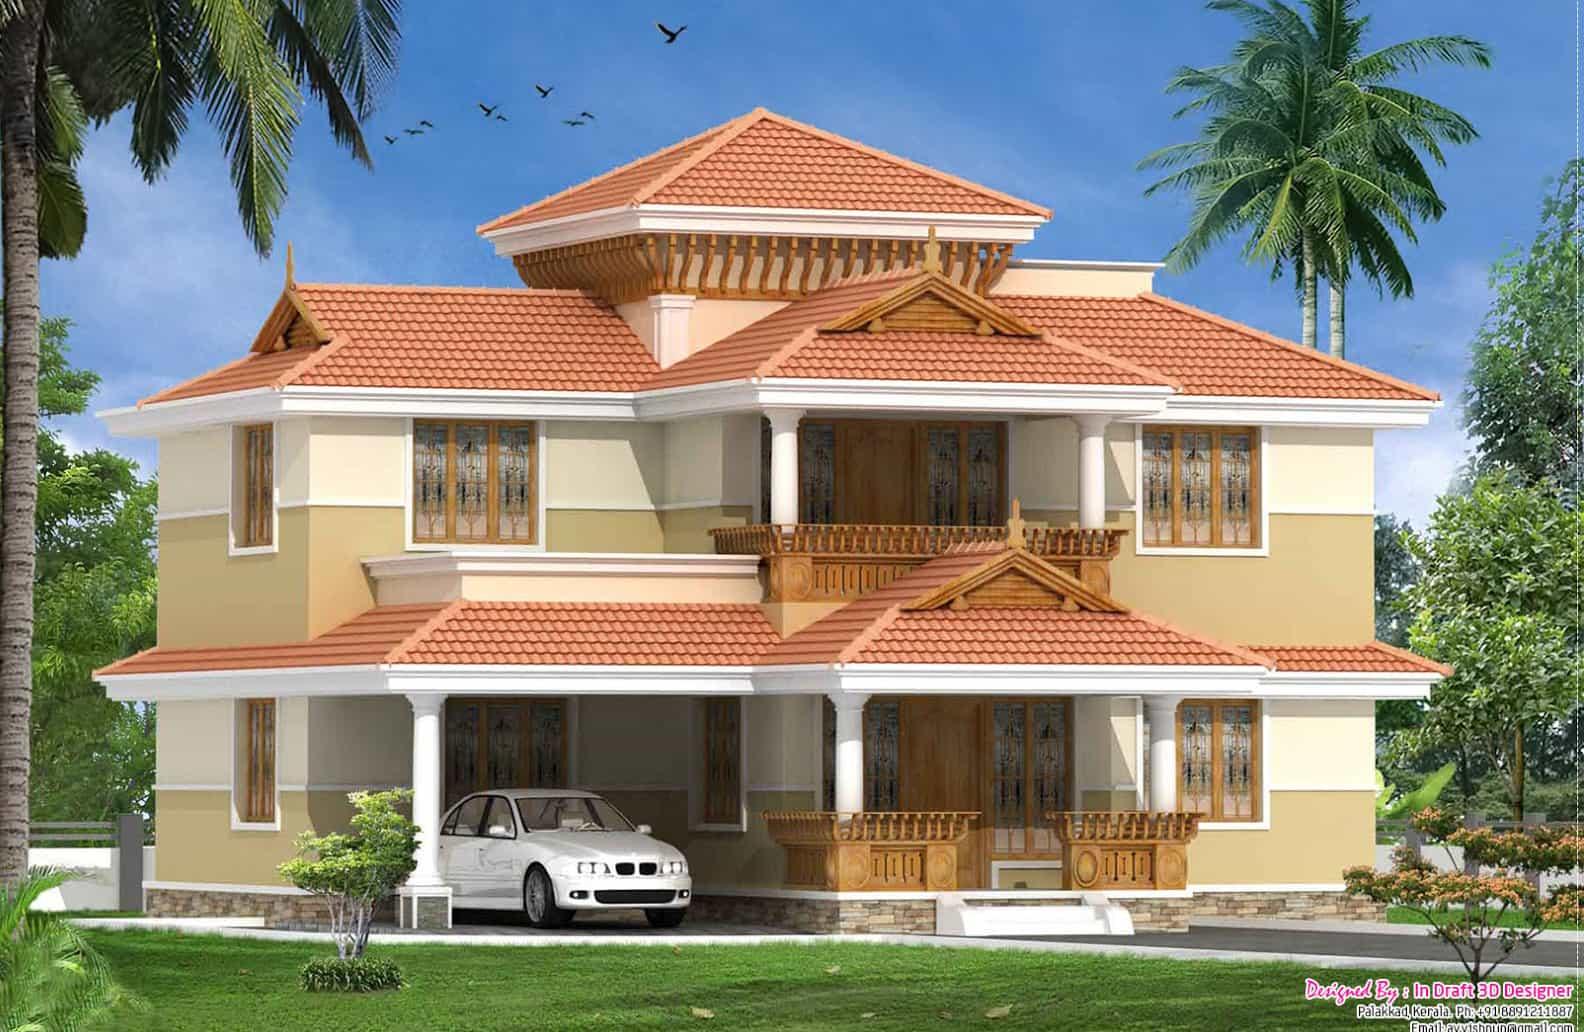 Kerala Villas - KeralaHousePlanner